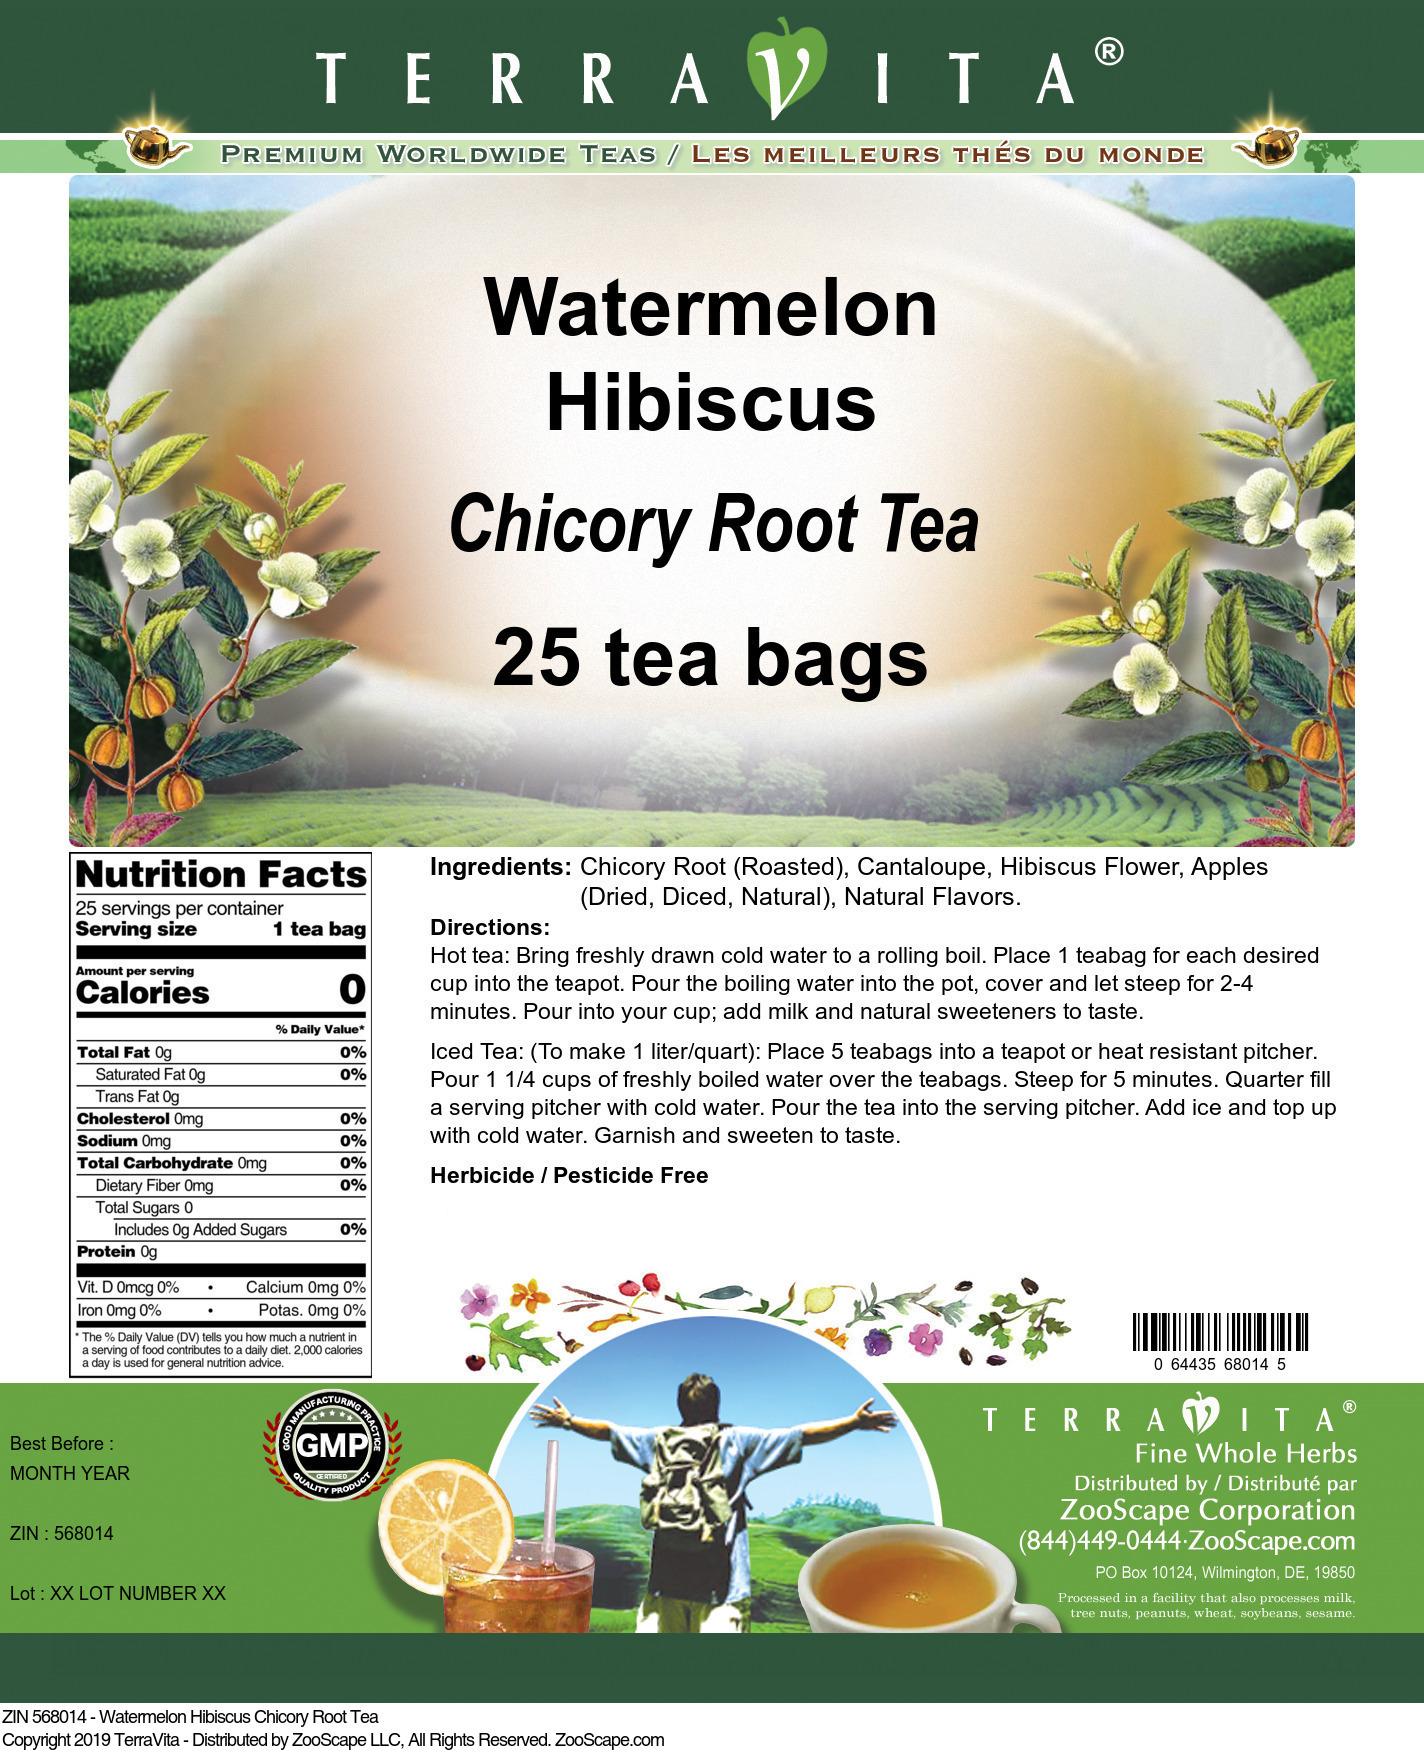 Watermelon Hibiscus Chicory Root Tea